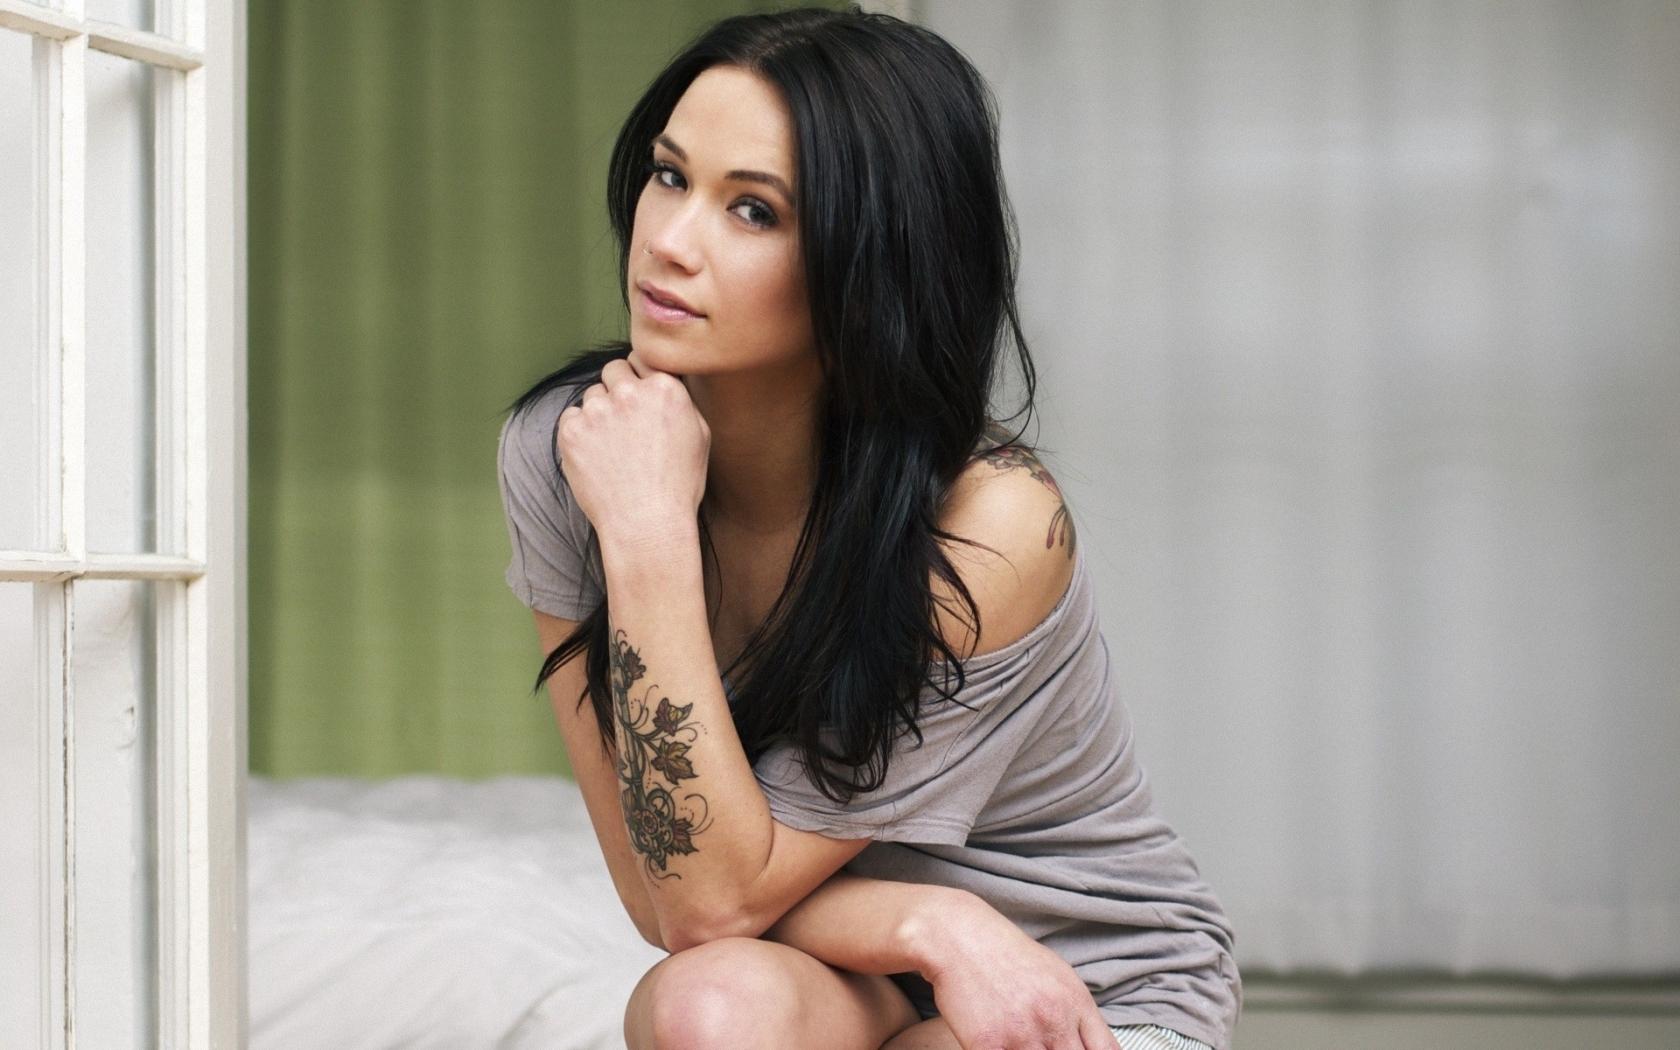 Megan Lyn y su tatuaje - 1680x1050